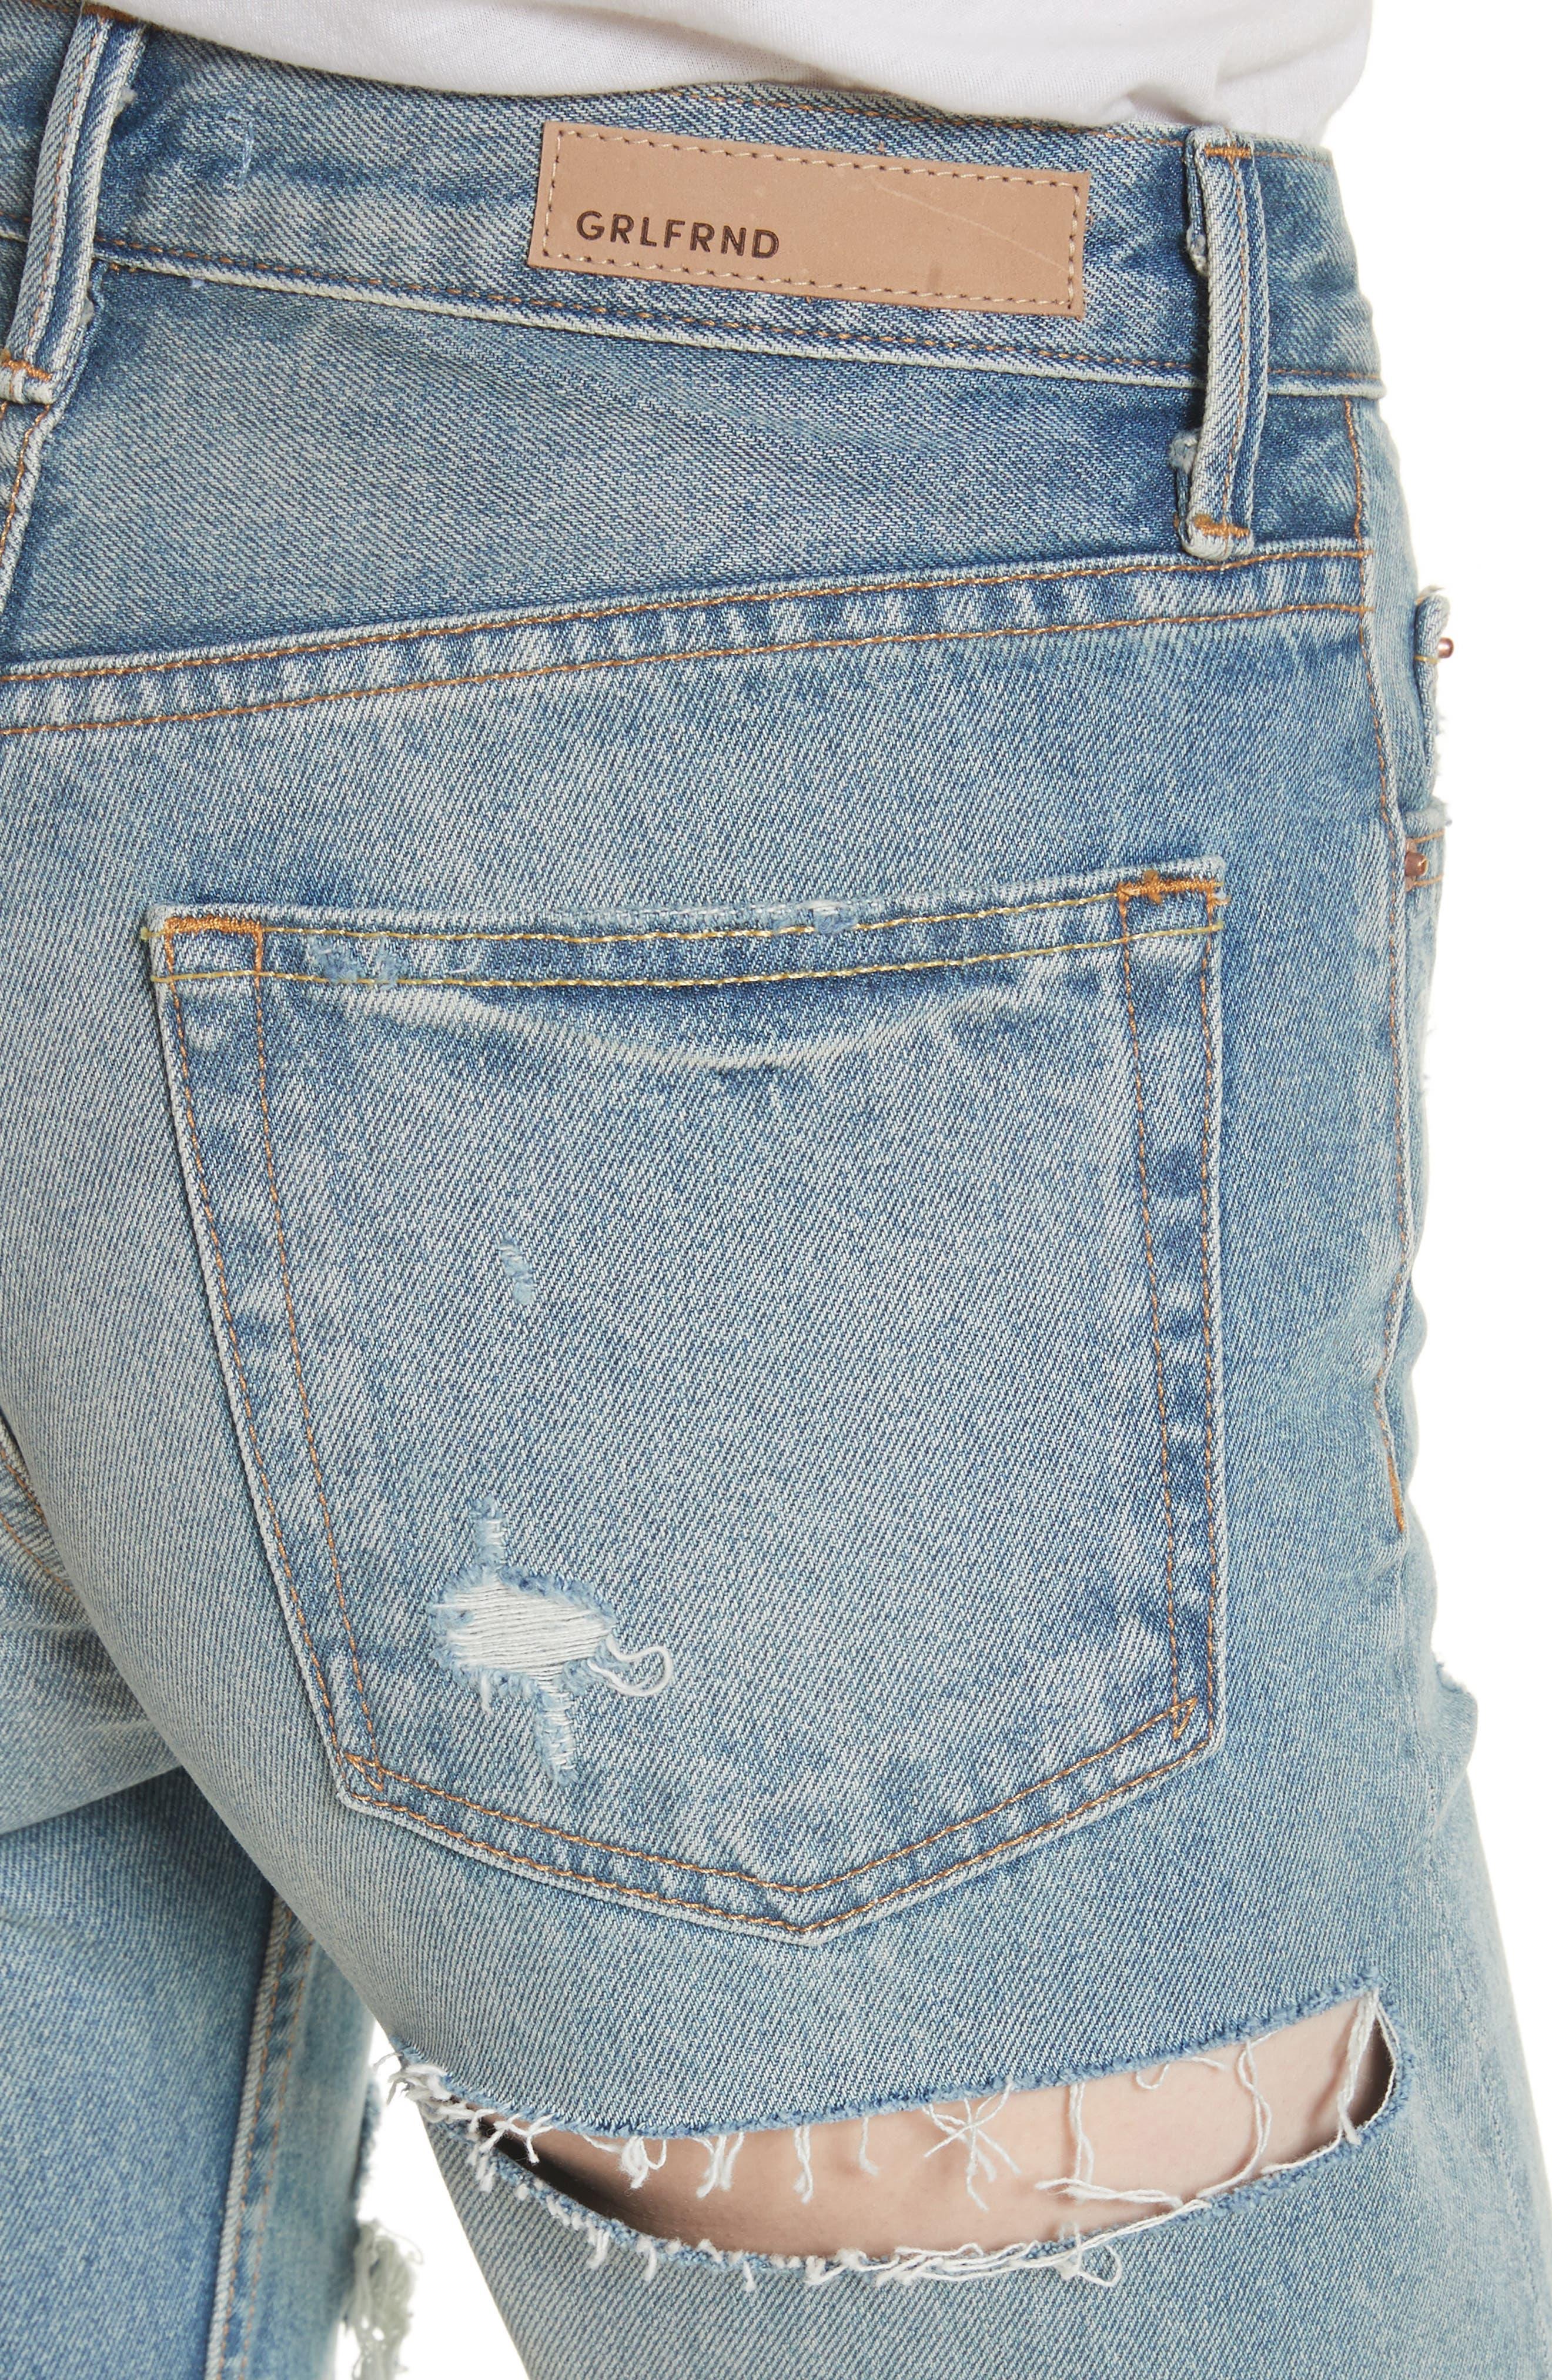 Alternate Image 4  - GRLFRND Karolina Ripped Rigid High Waist Skinny Jeans (A Little More Love)